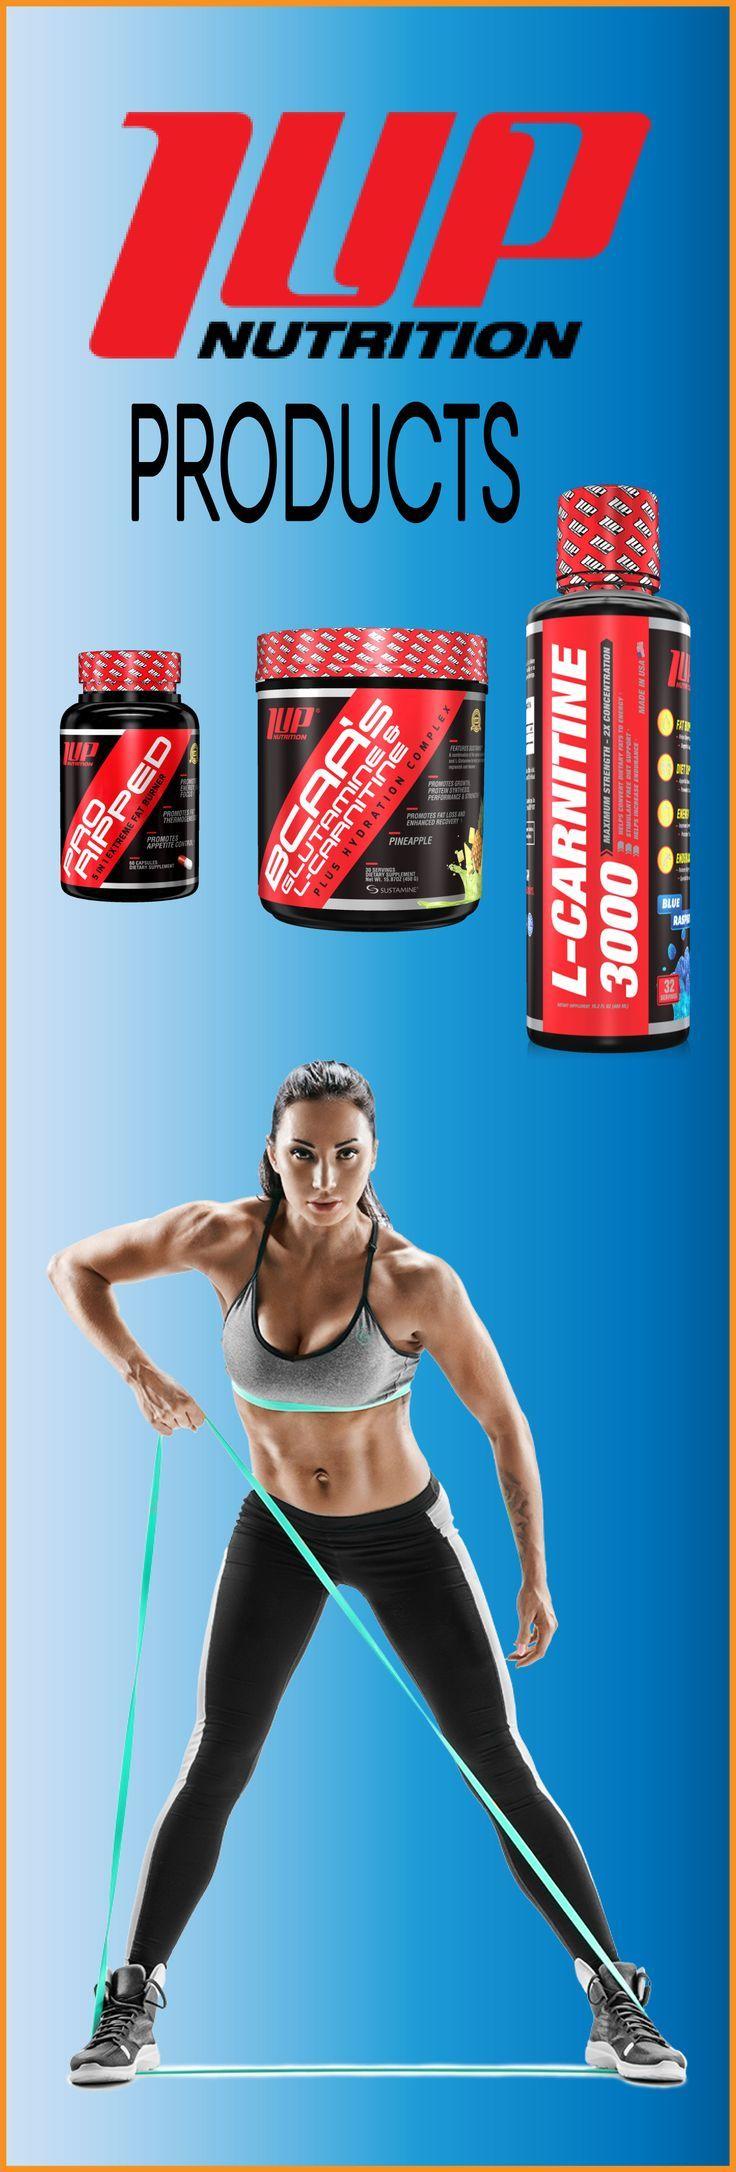 1up Nutrition 1up Nutrition Nutrition Athlete Nutrition Workout Supplements